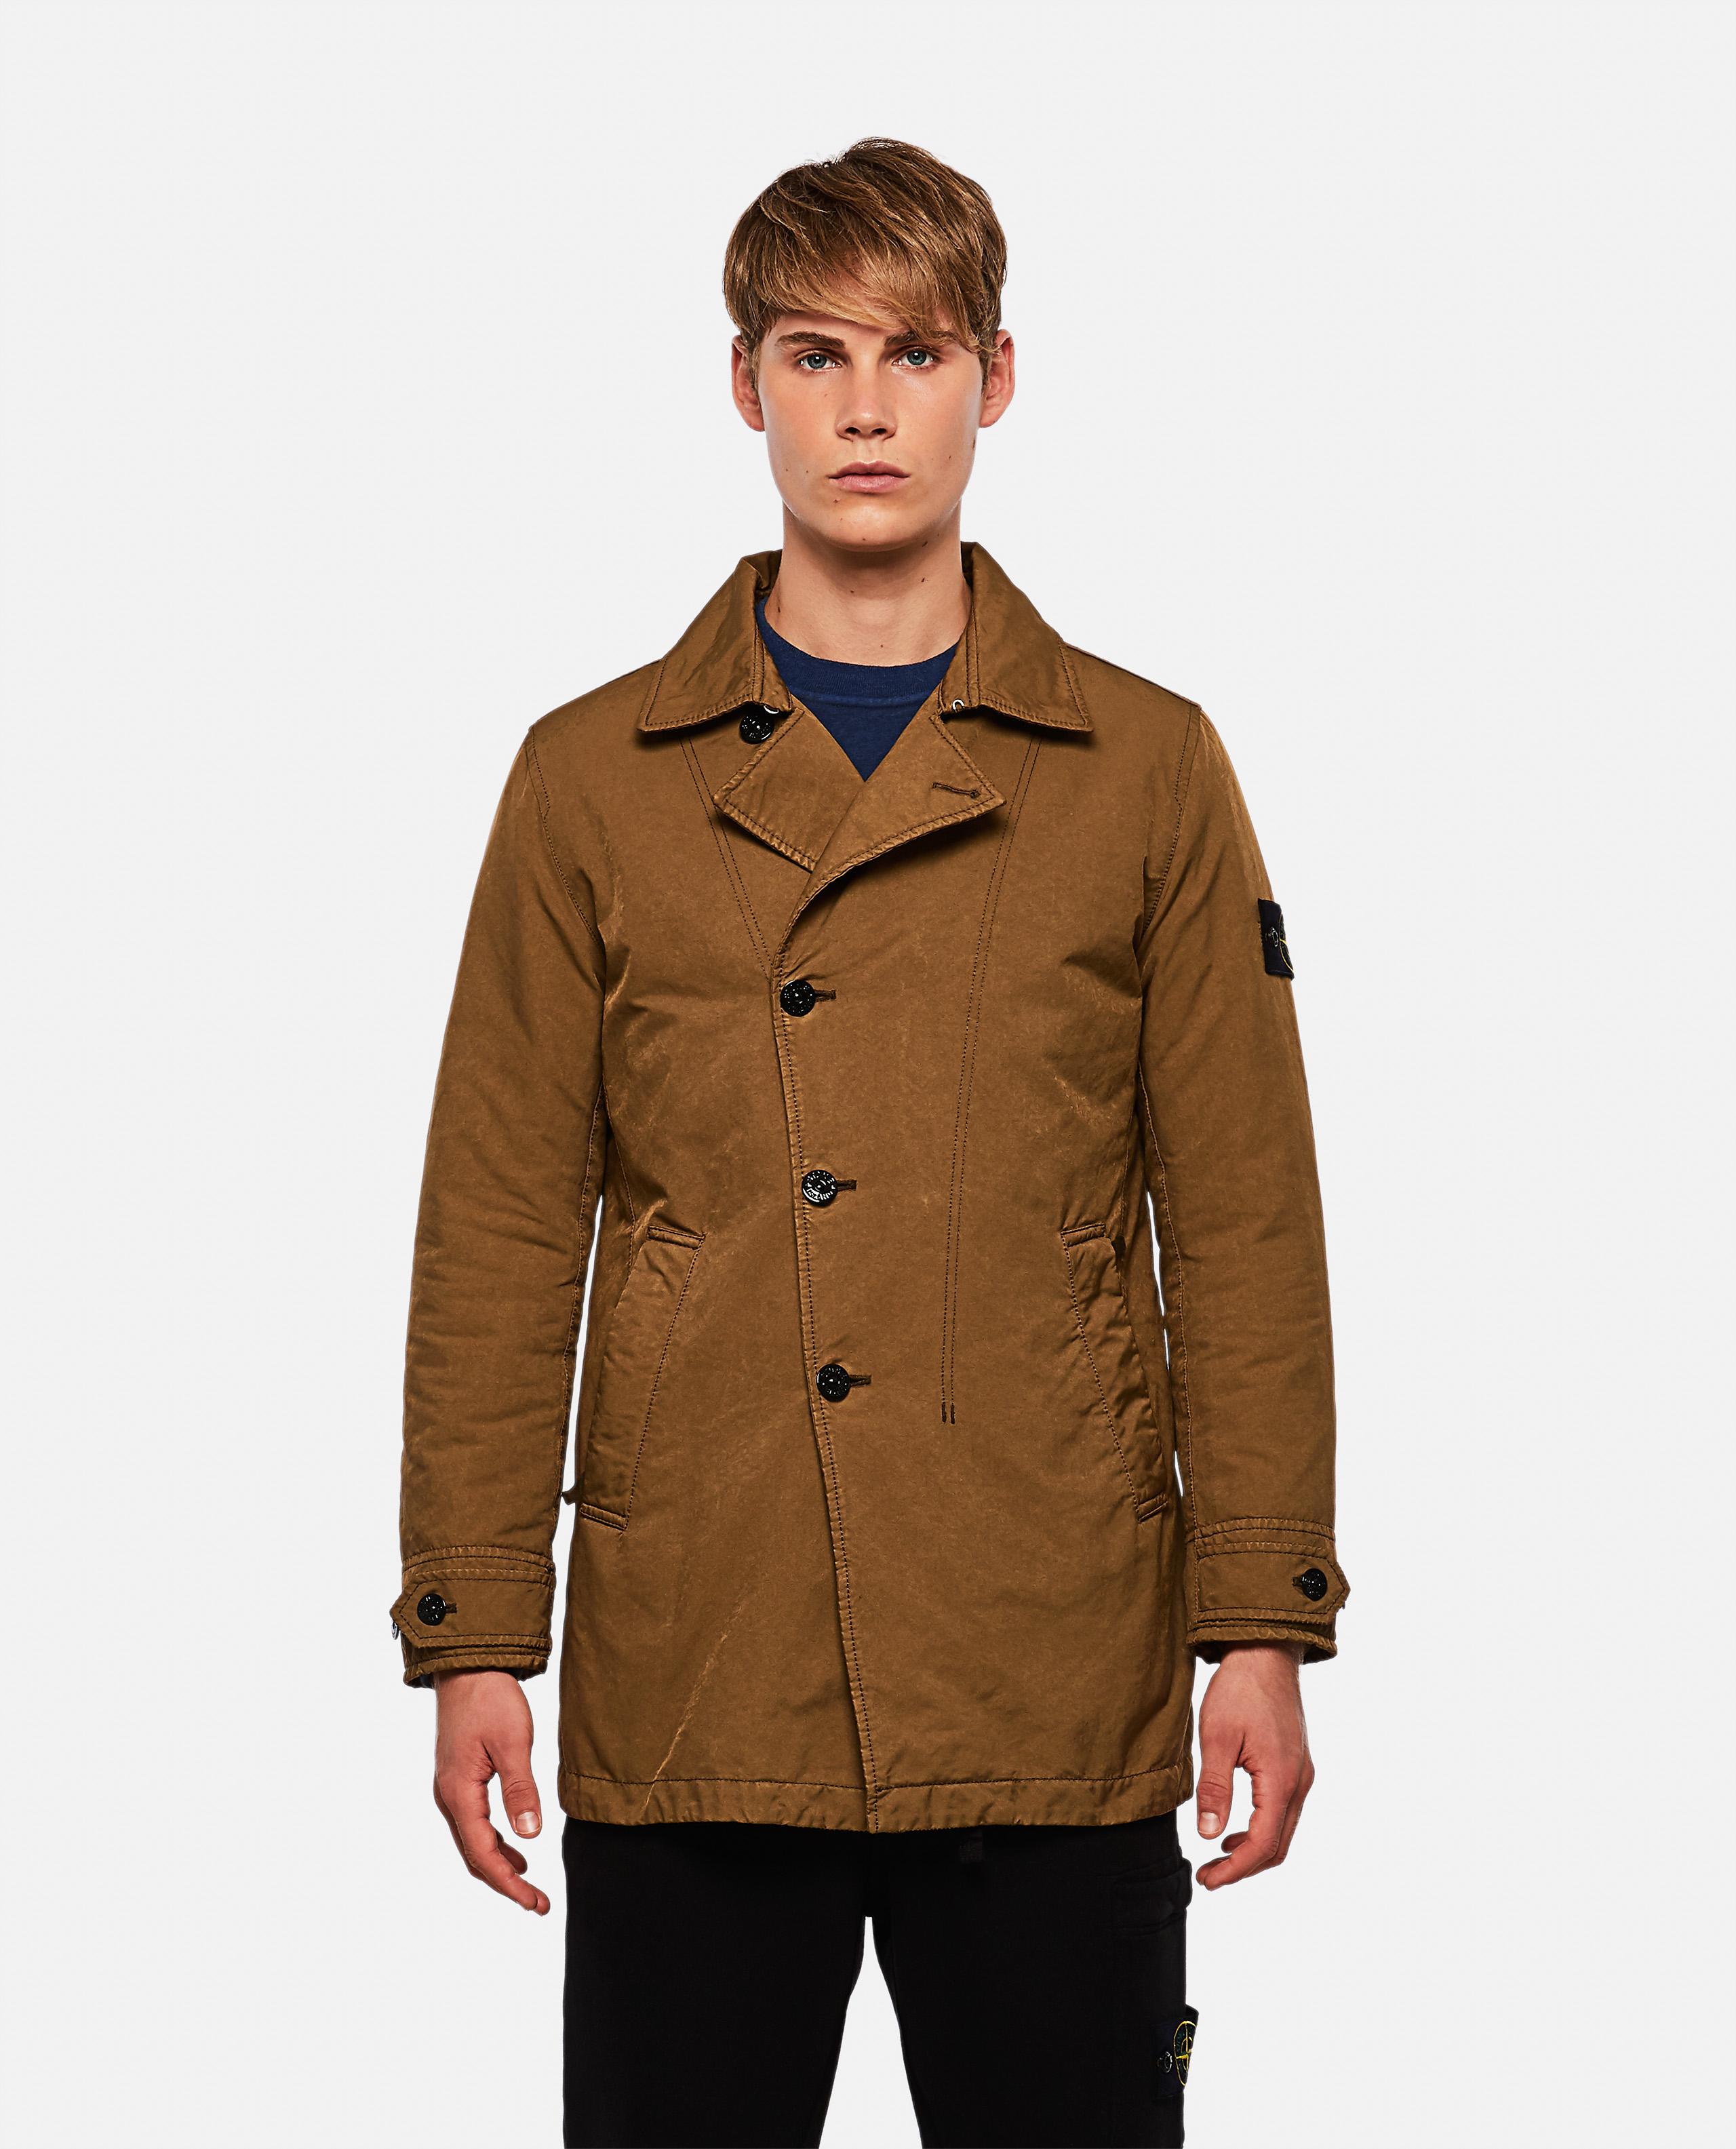 Coat with off-center closure